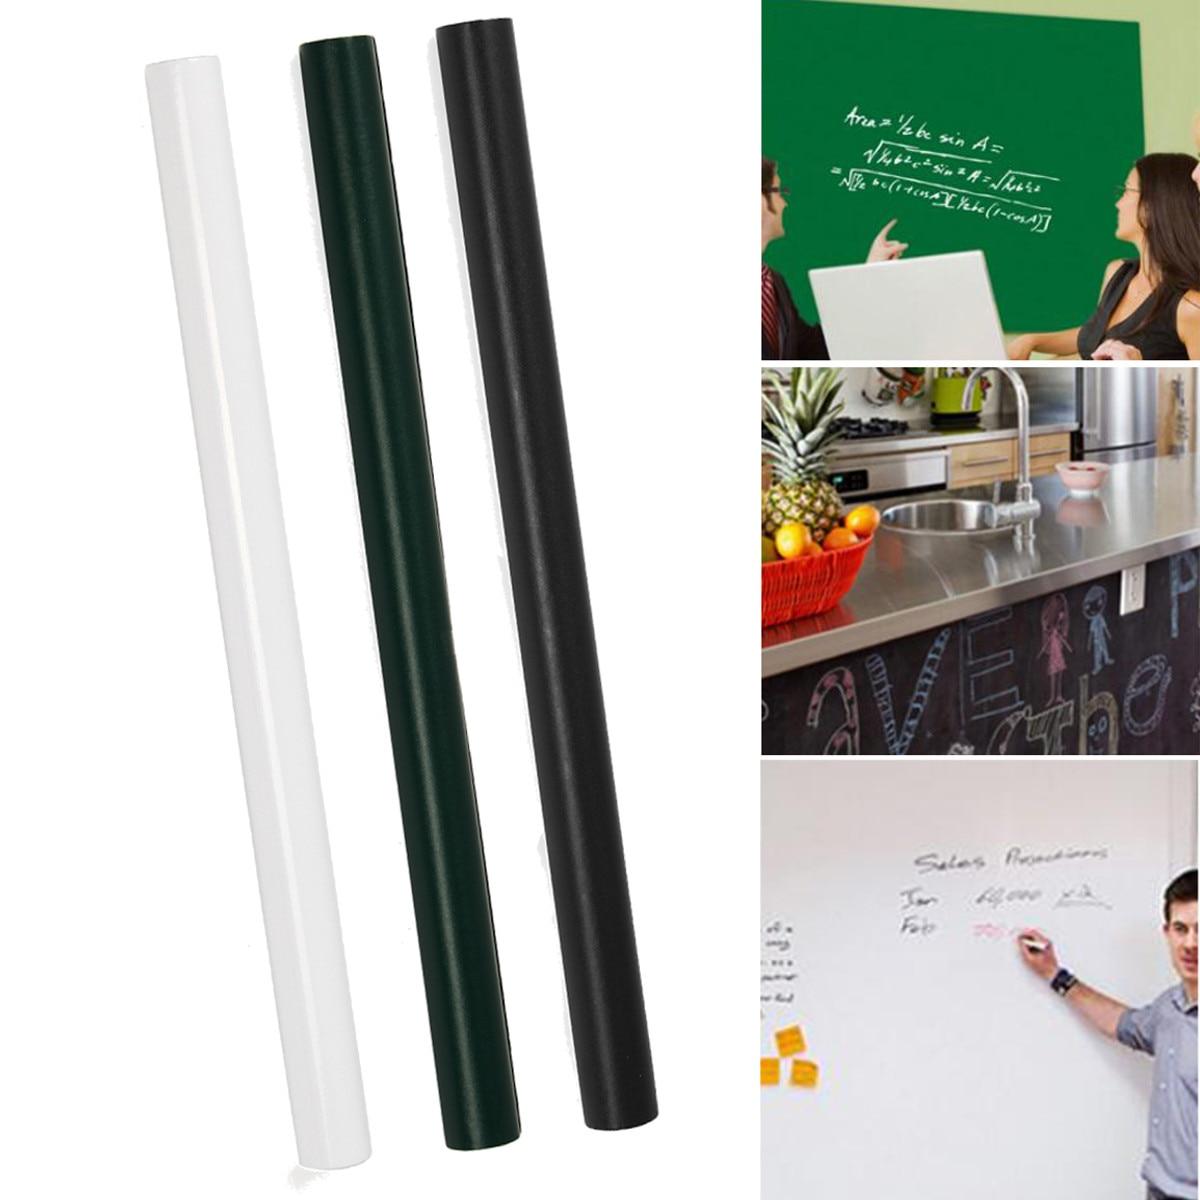 Wallpaper Whiteboard Sticker White Board Self-adhesive Writing Memo Board Removable Wall Sticker For Office School Home